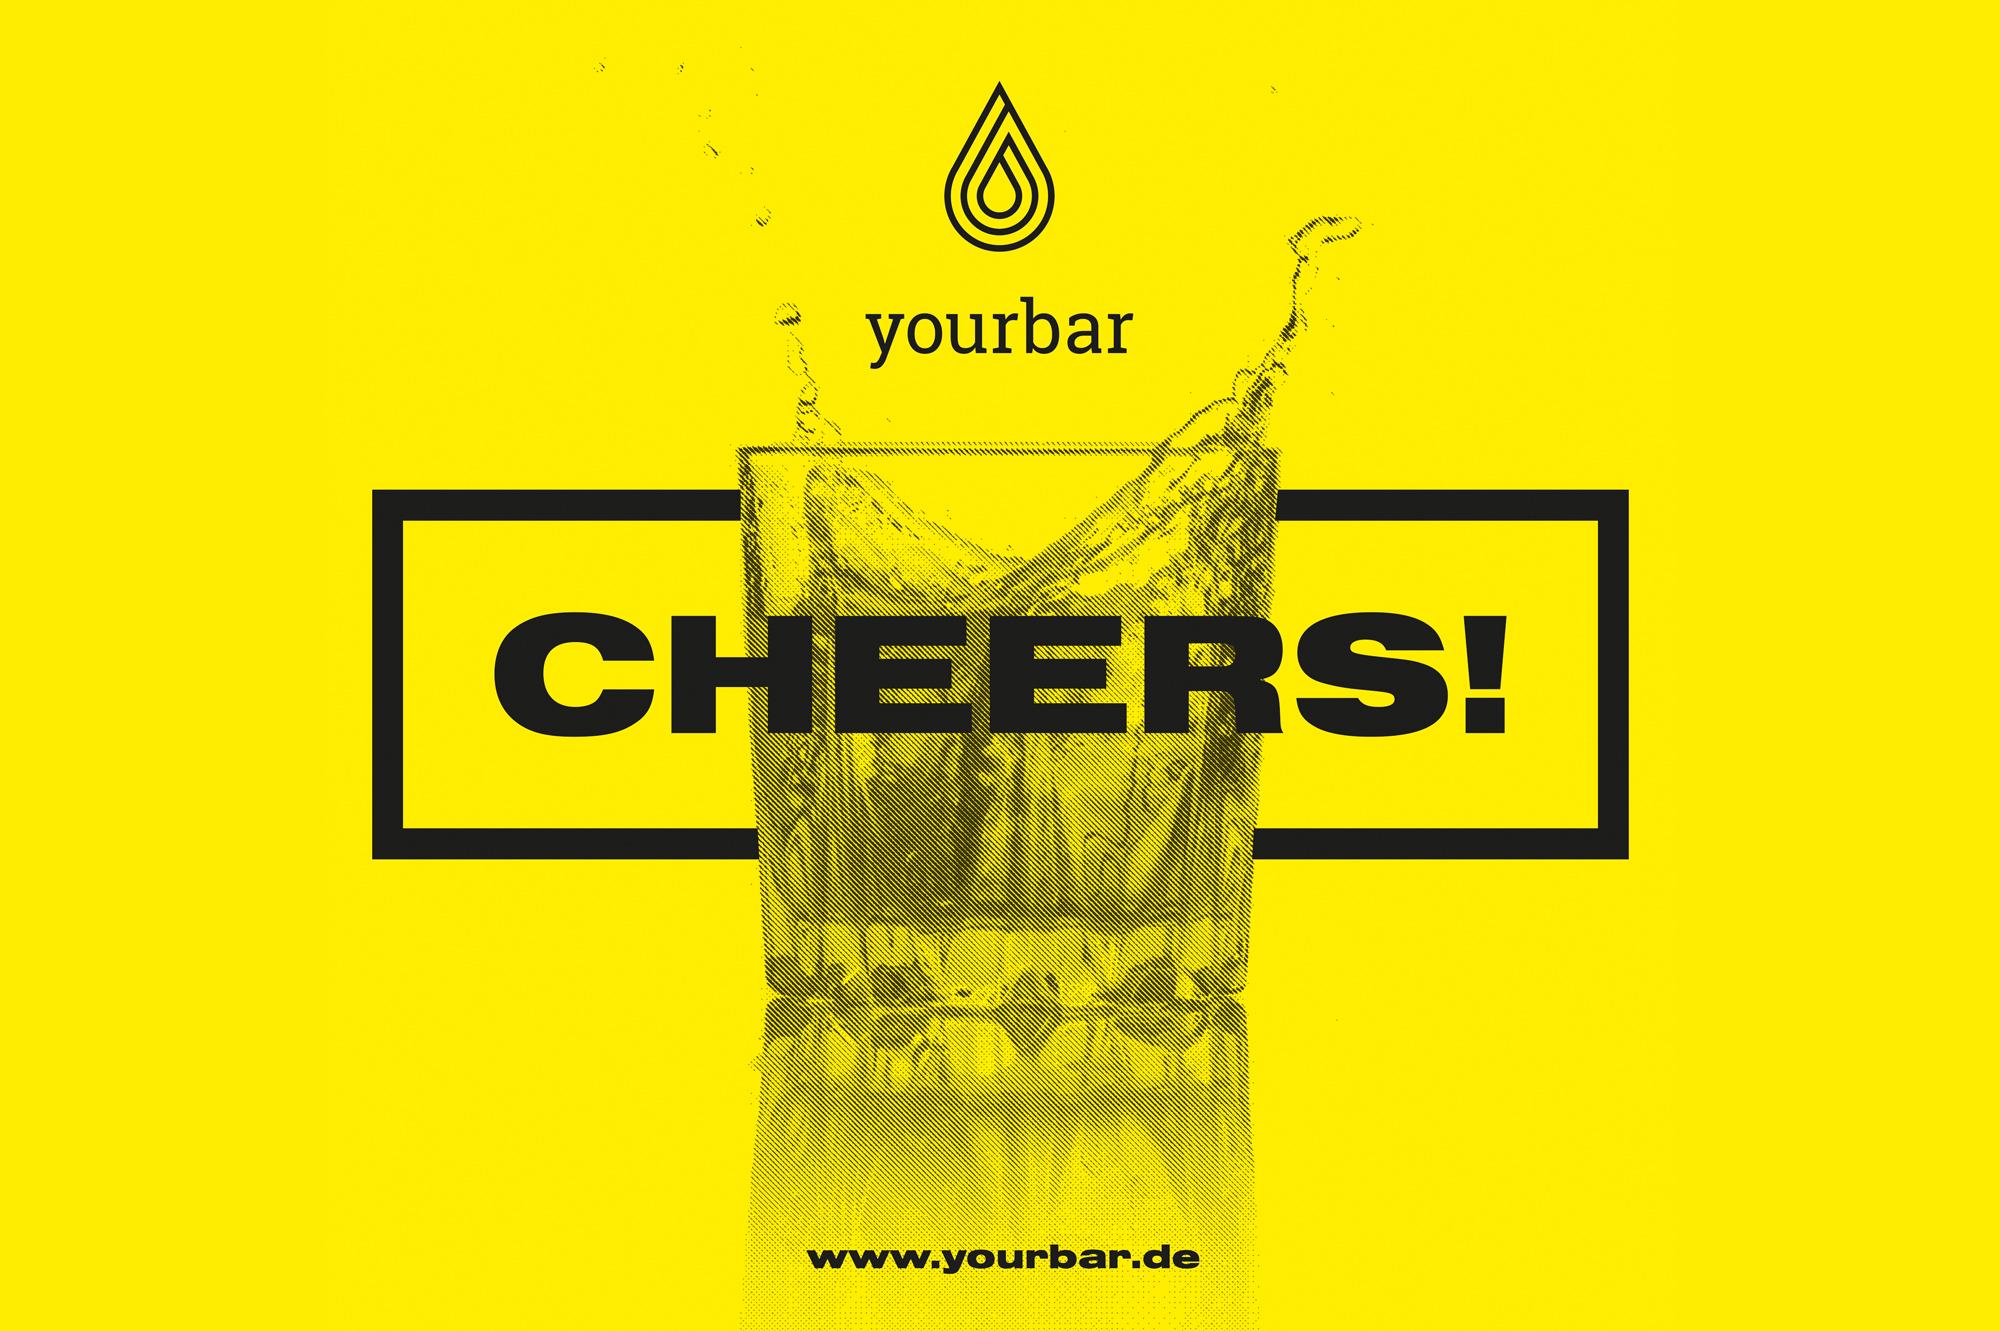 (c) Yourbar.de